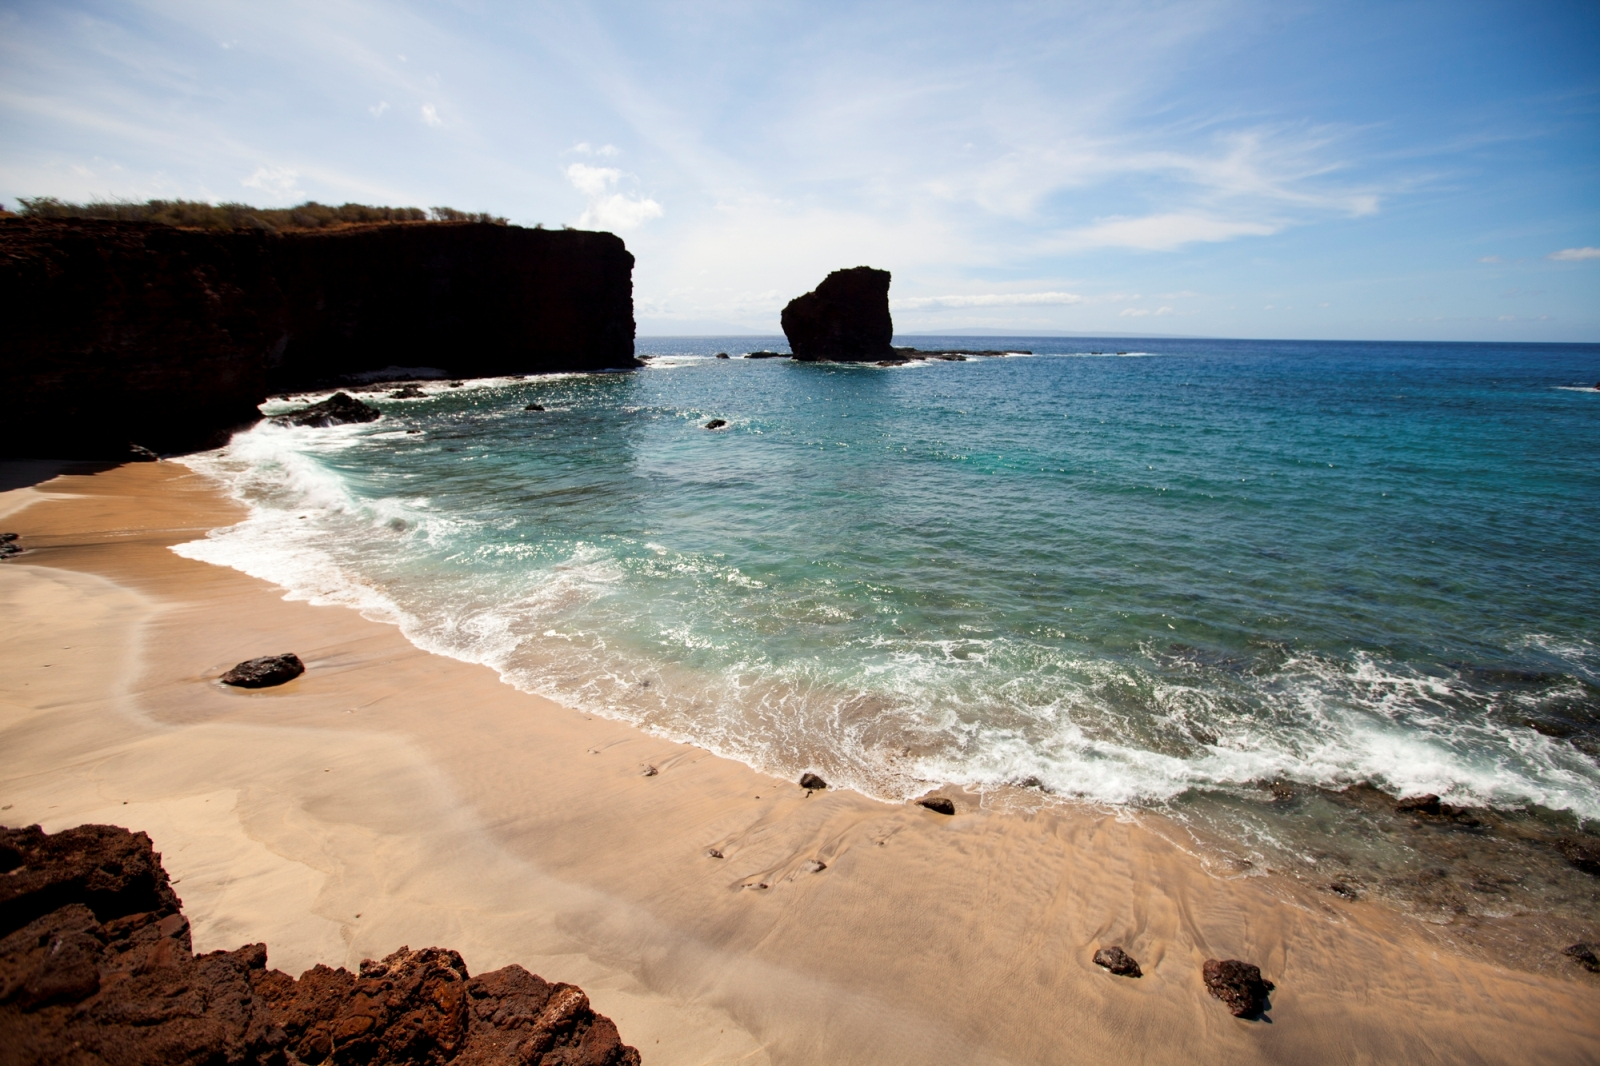 Hawaii Tourism Authority ( HTA ) / Dana Edmunds